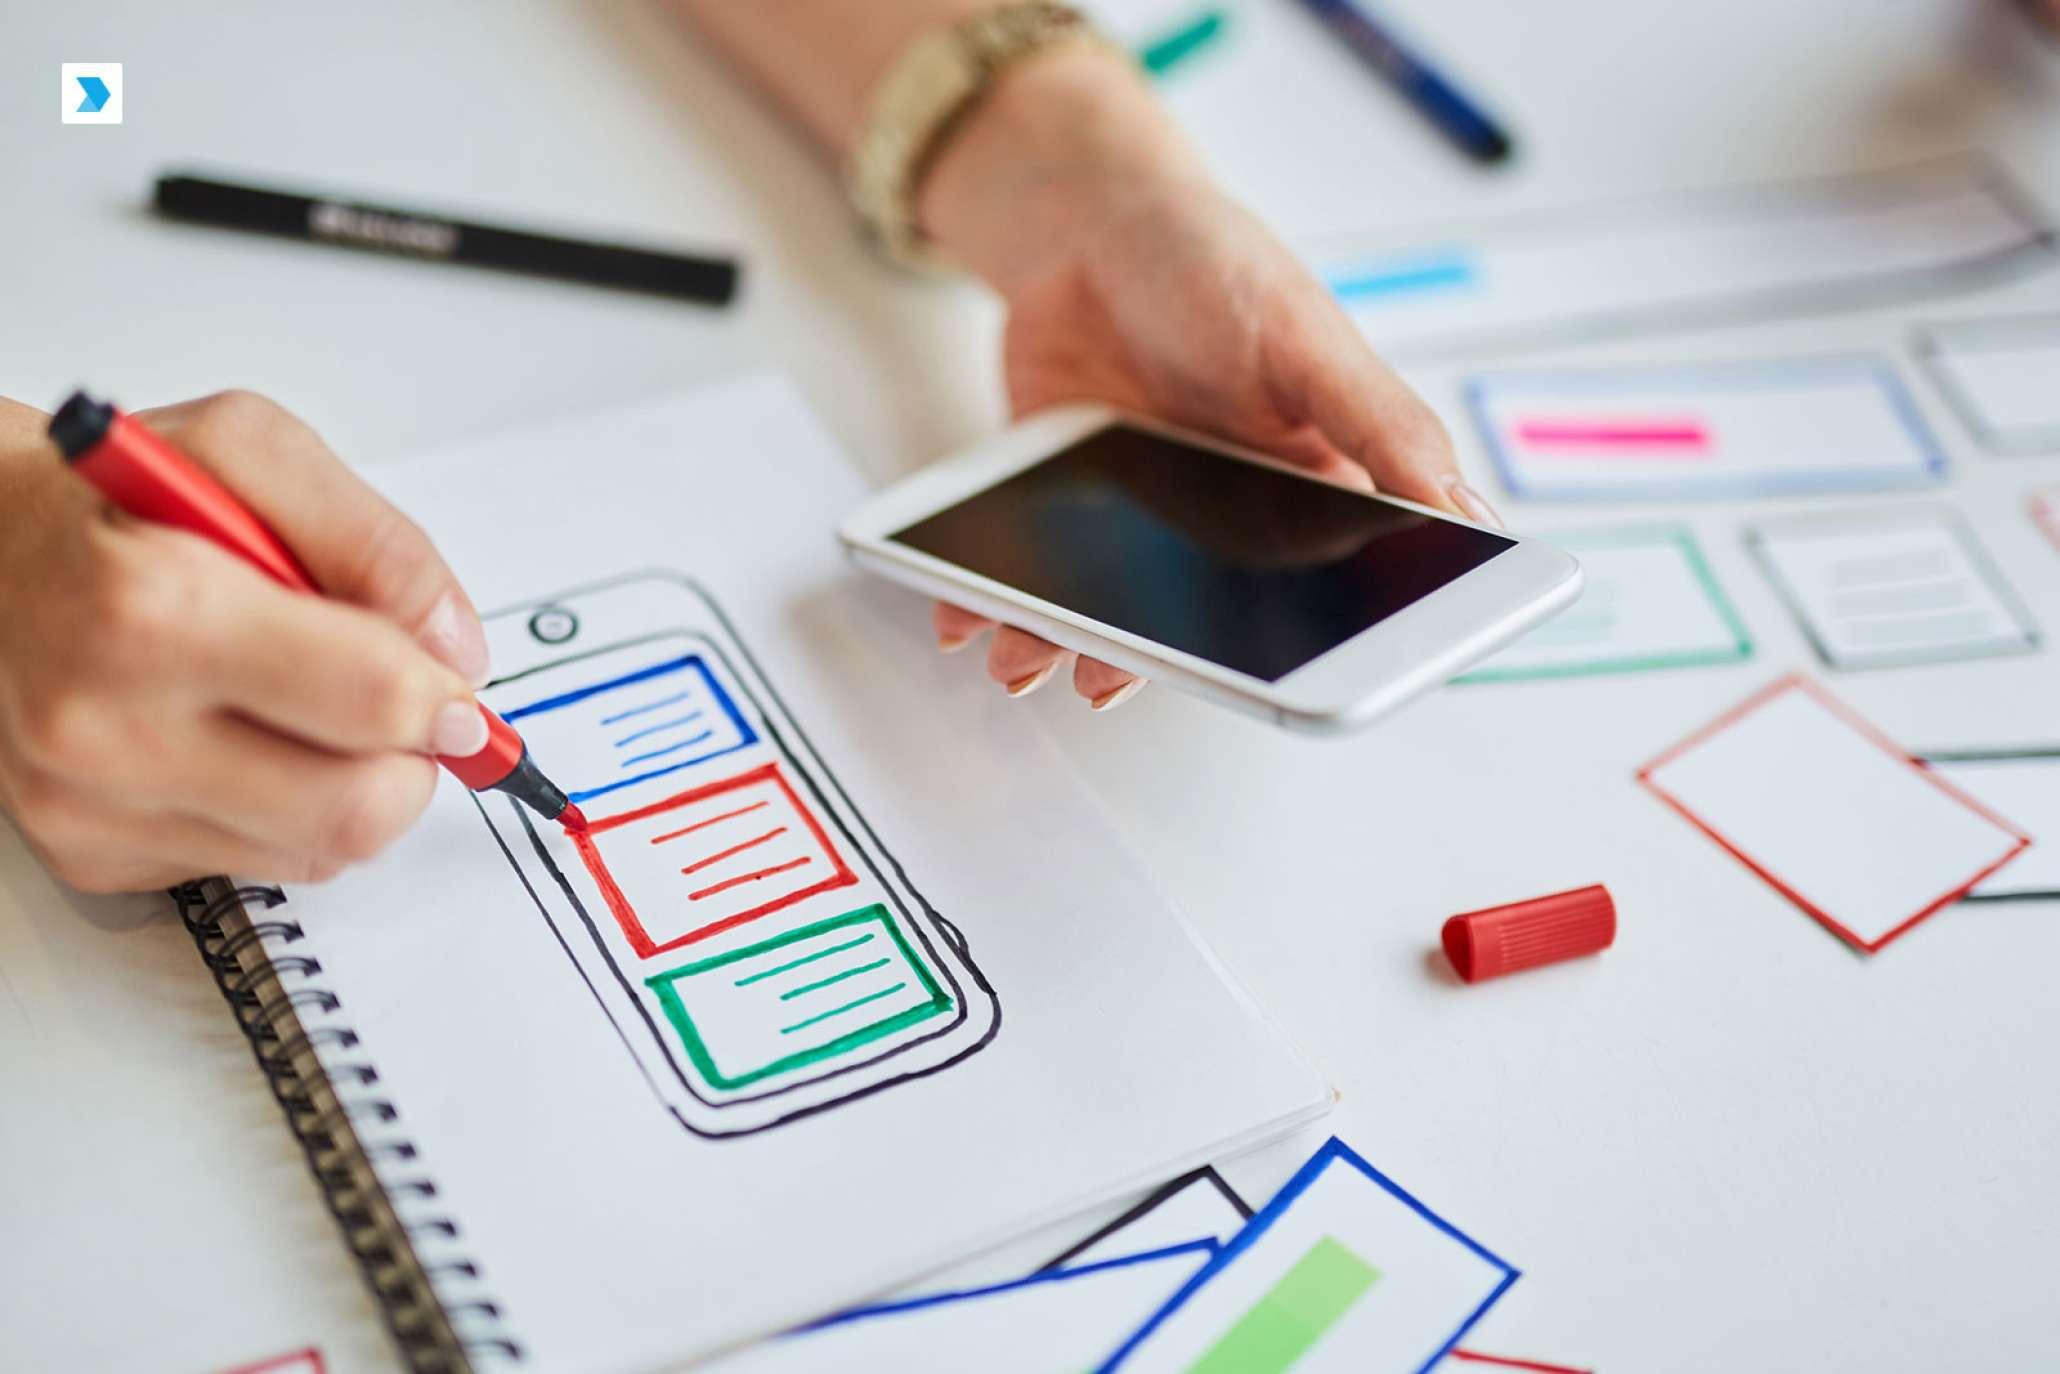 Marketing Web Design: 11 Web Design Trends To Watch In 2018